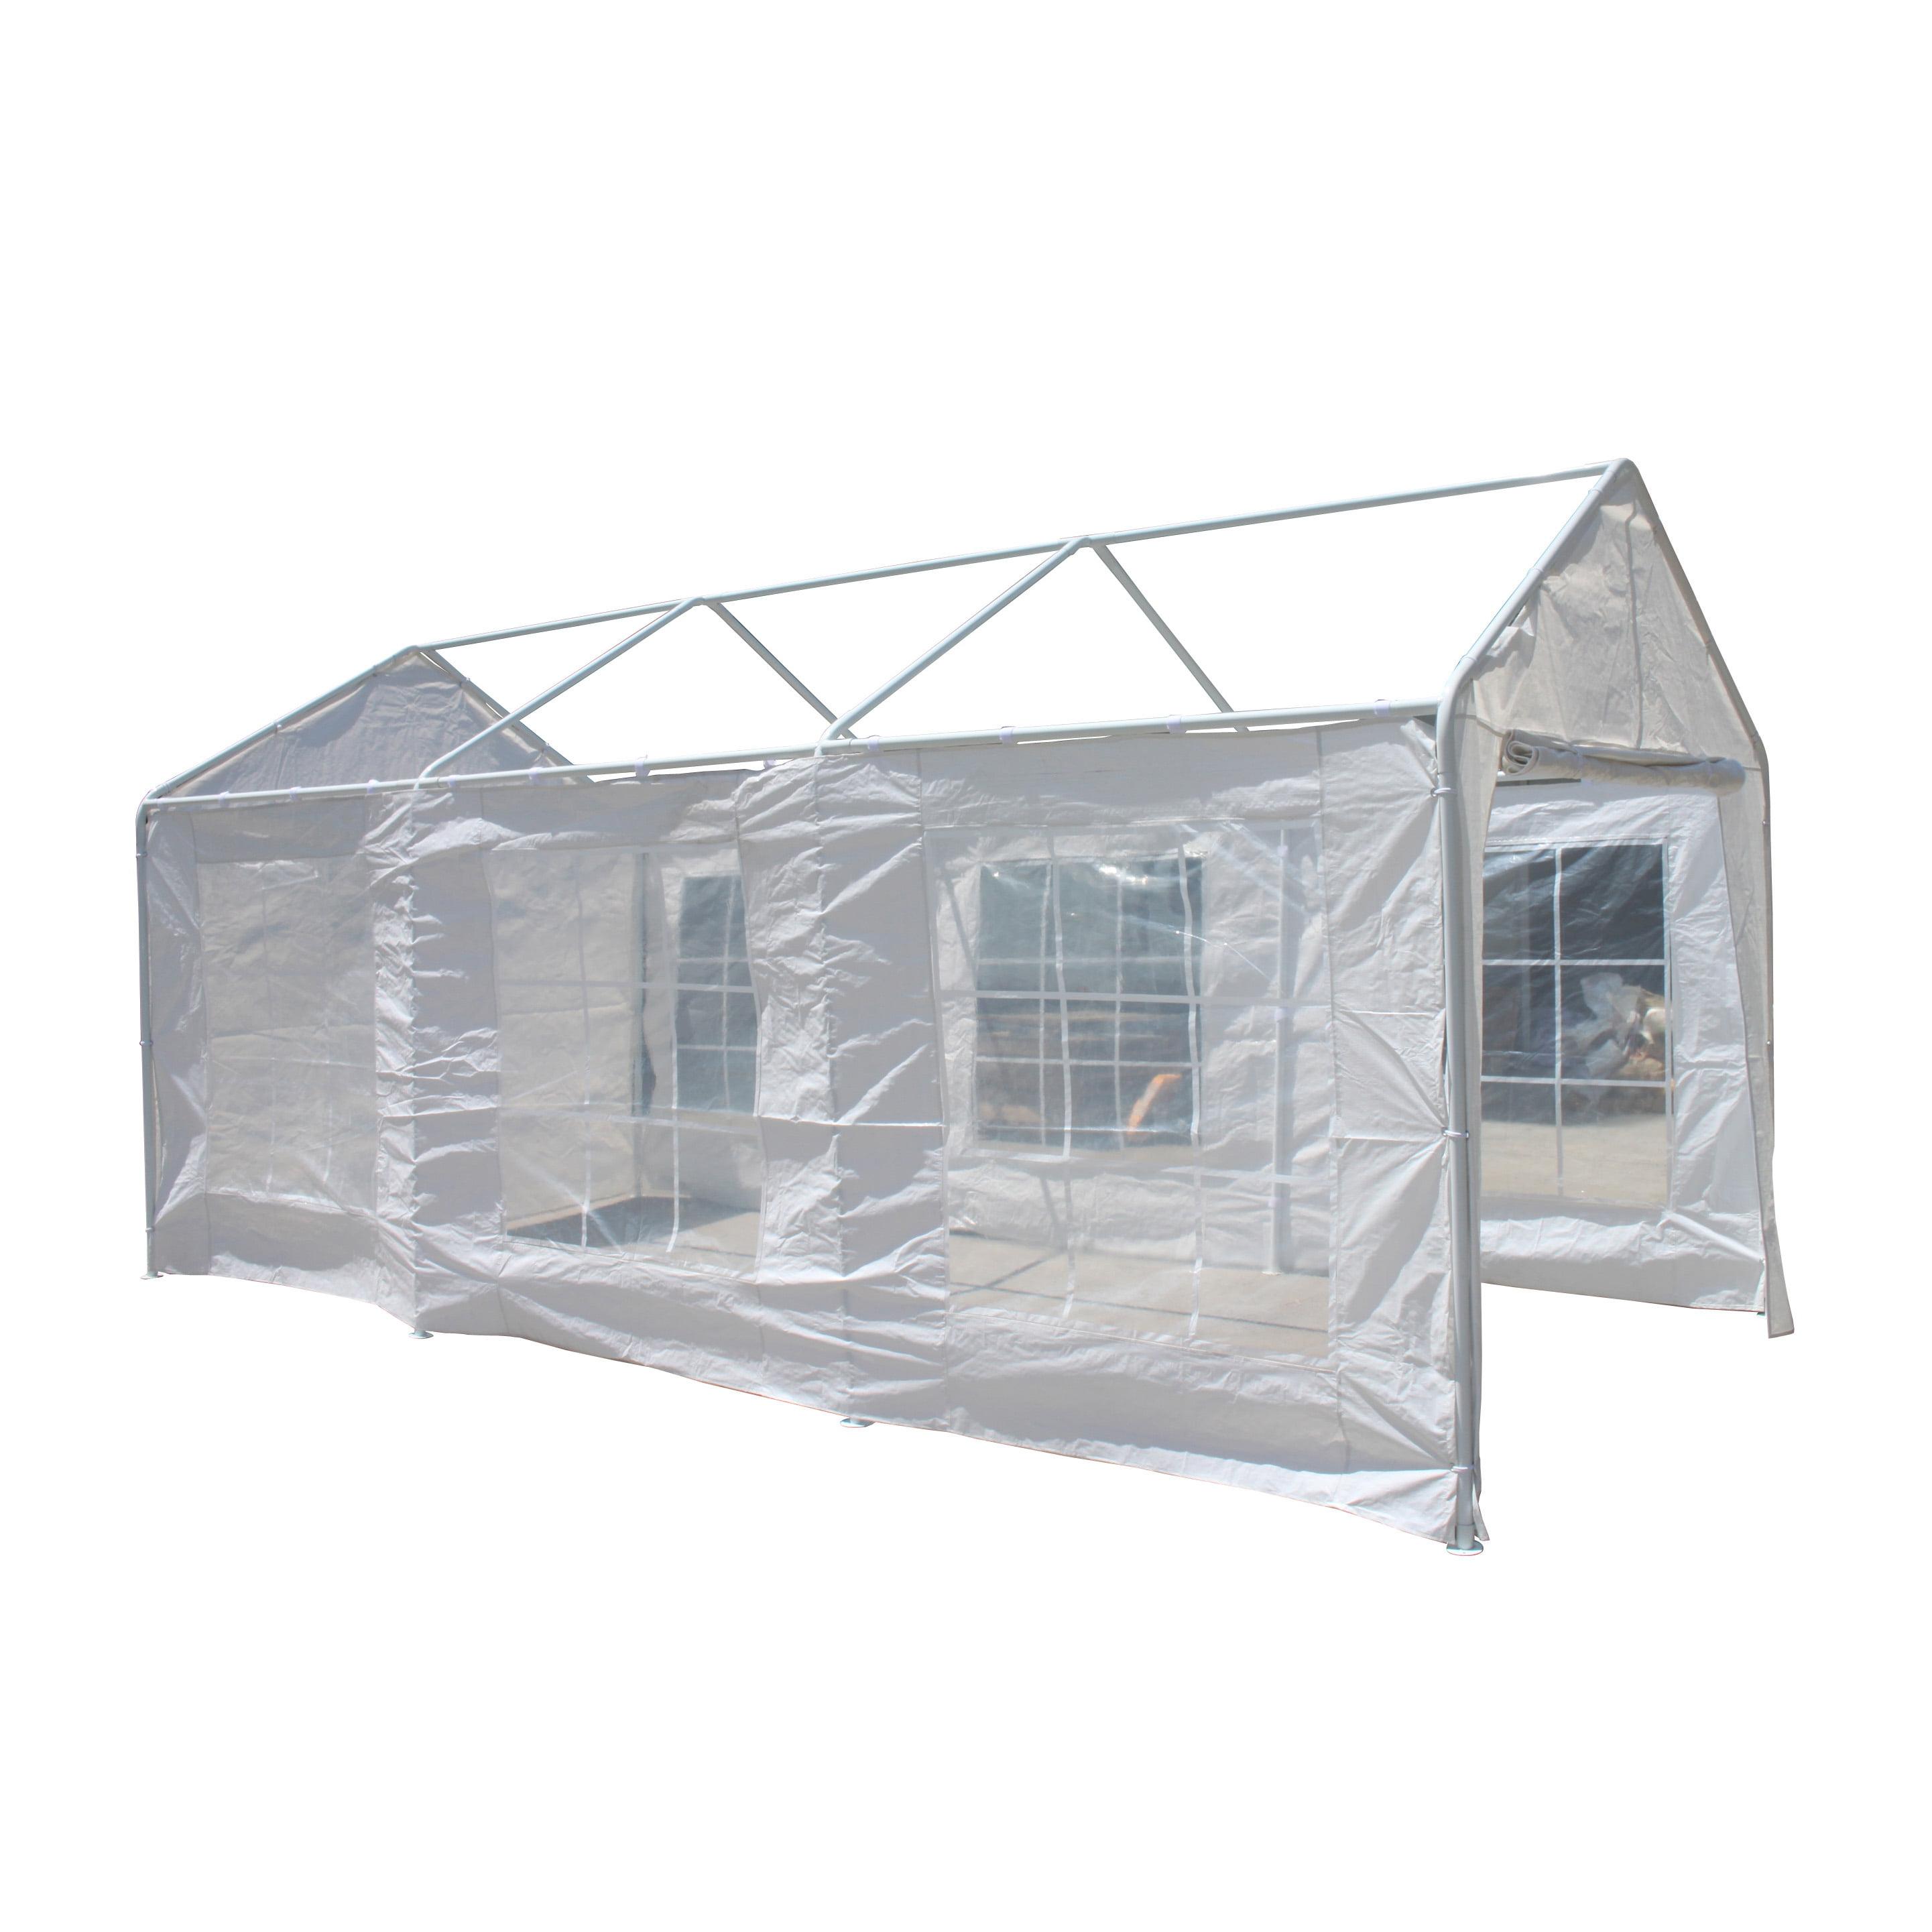 ALEKO 10' x 20' Polyethylene Caravan Carport Sidewalls with Windows, Heavy Duty, White Color